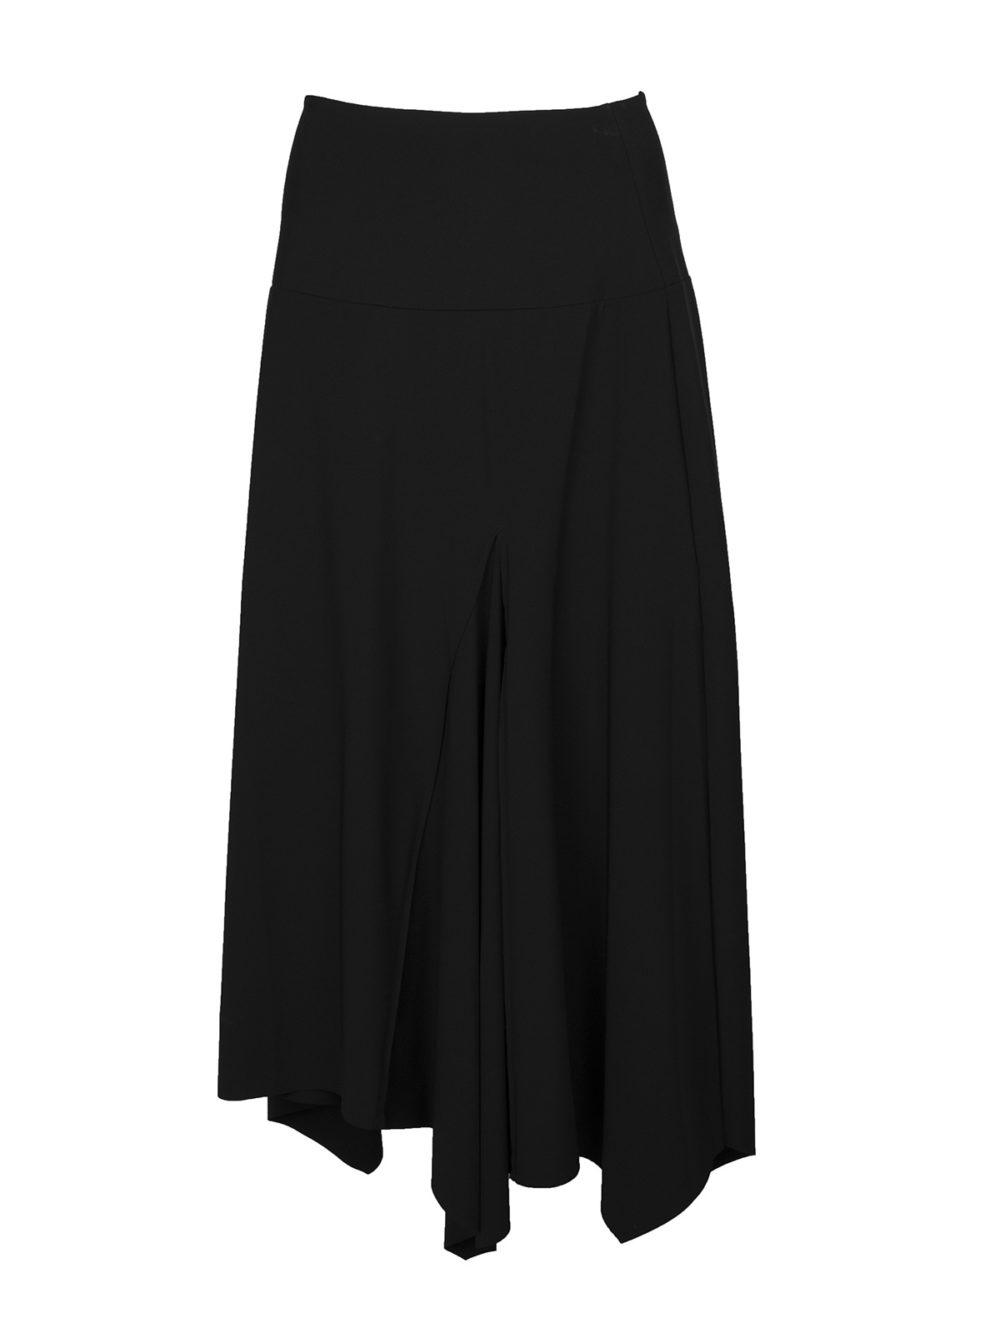 Ita Skirt EL164